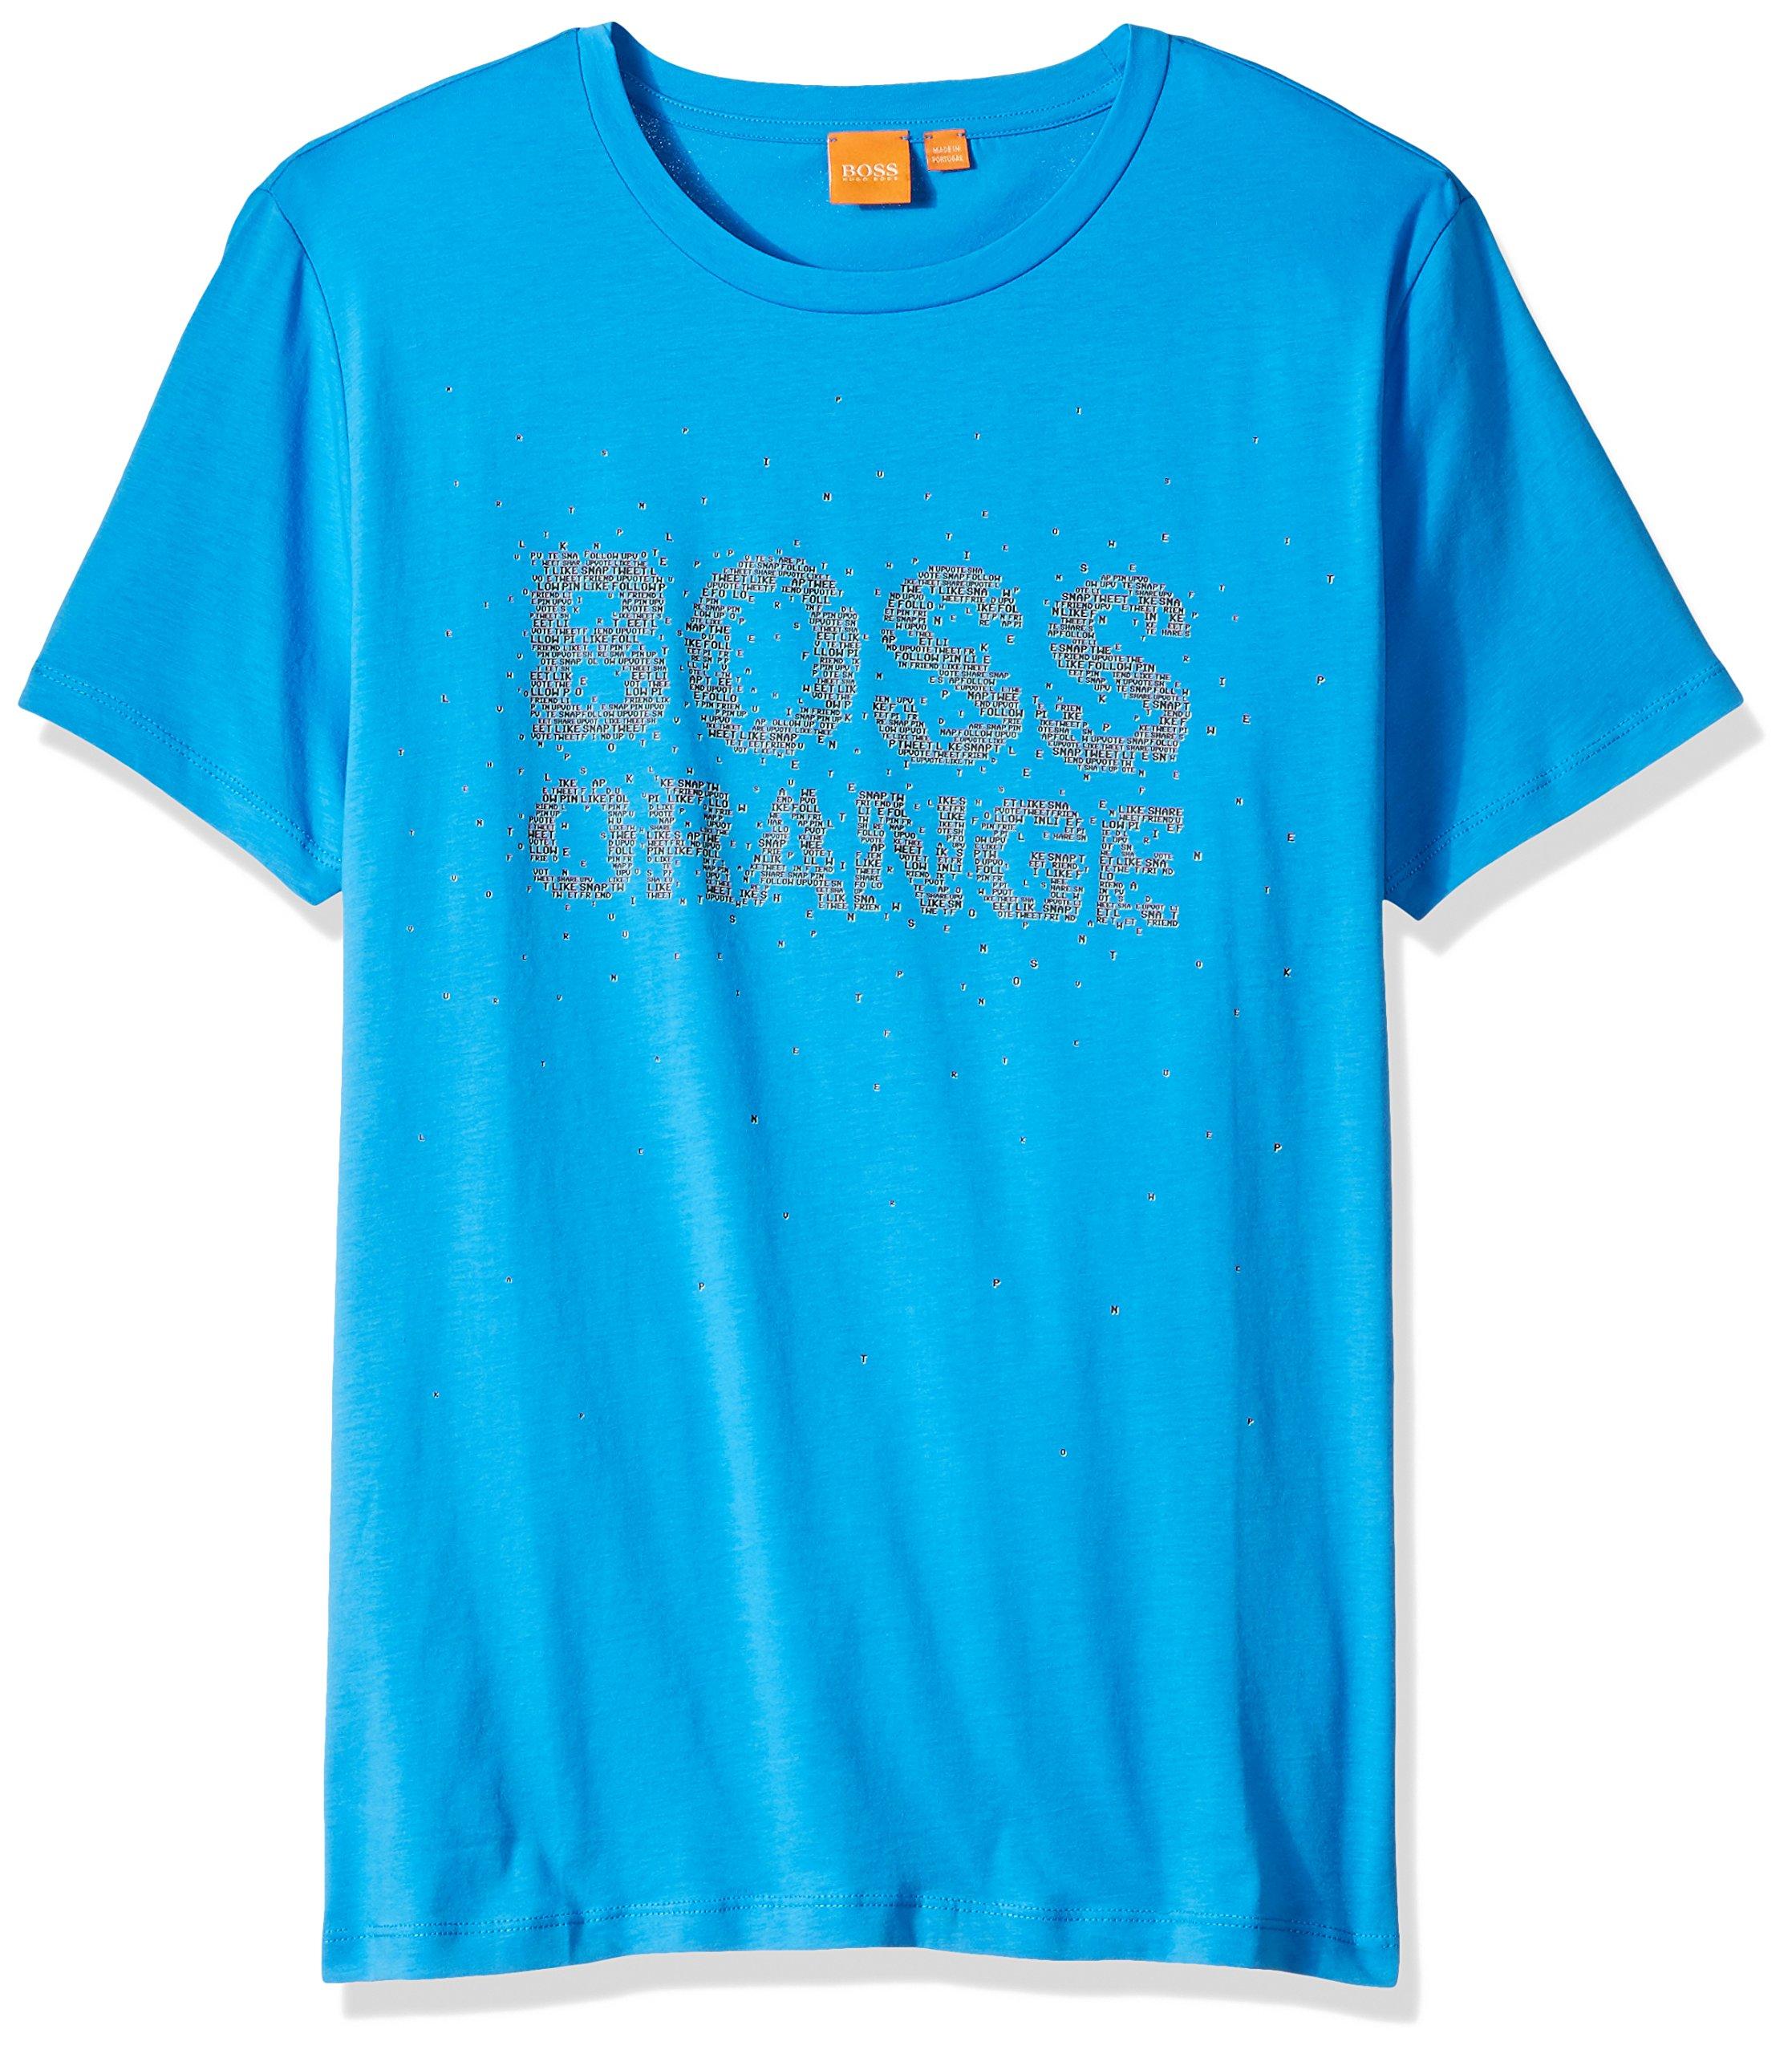 BOSS Orange Men's Turbulence 1 10131643 01, Bright Blue, XXL